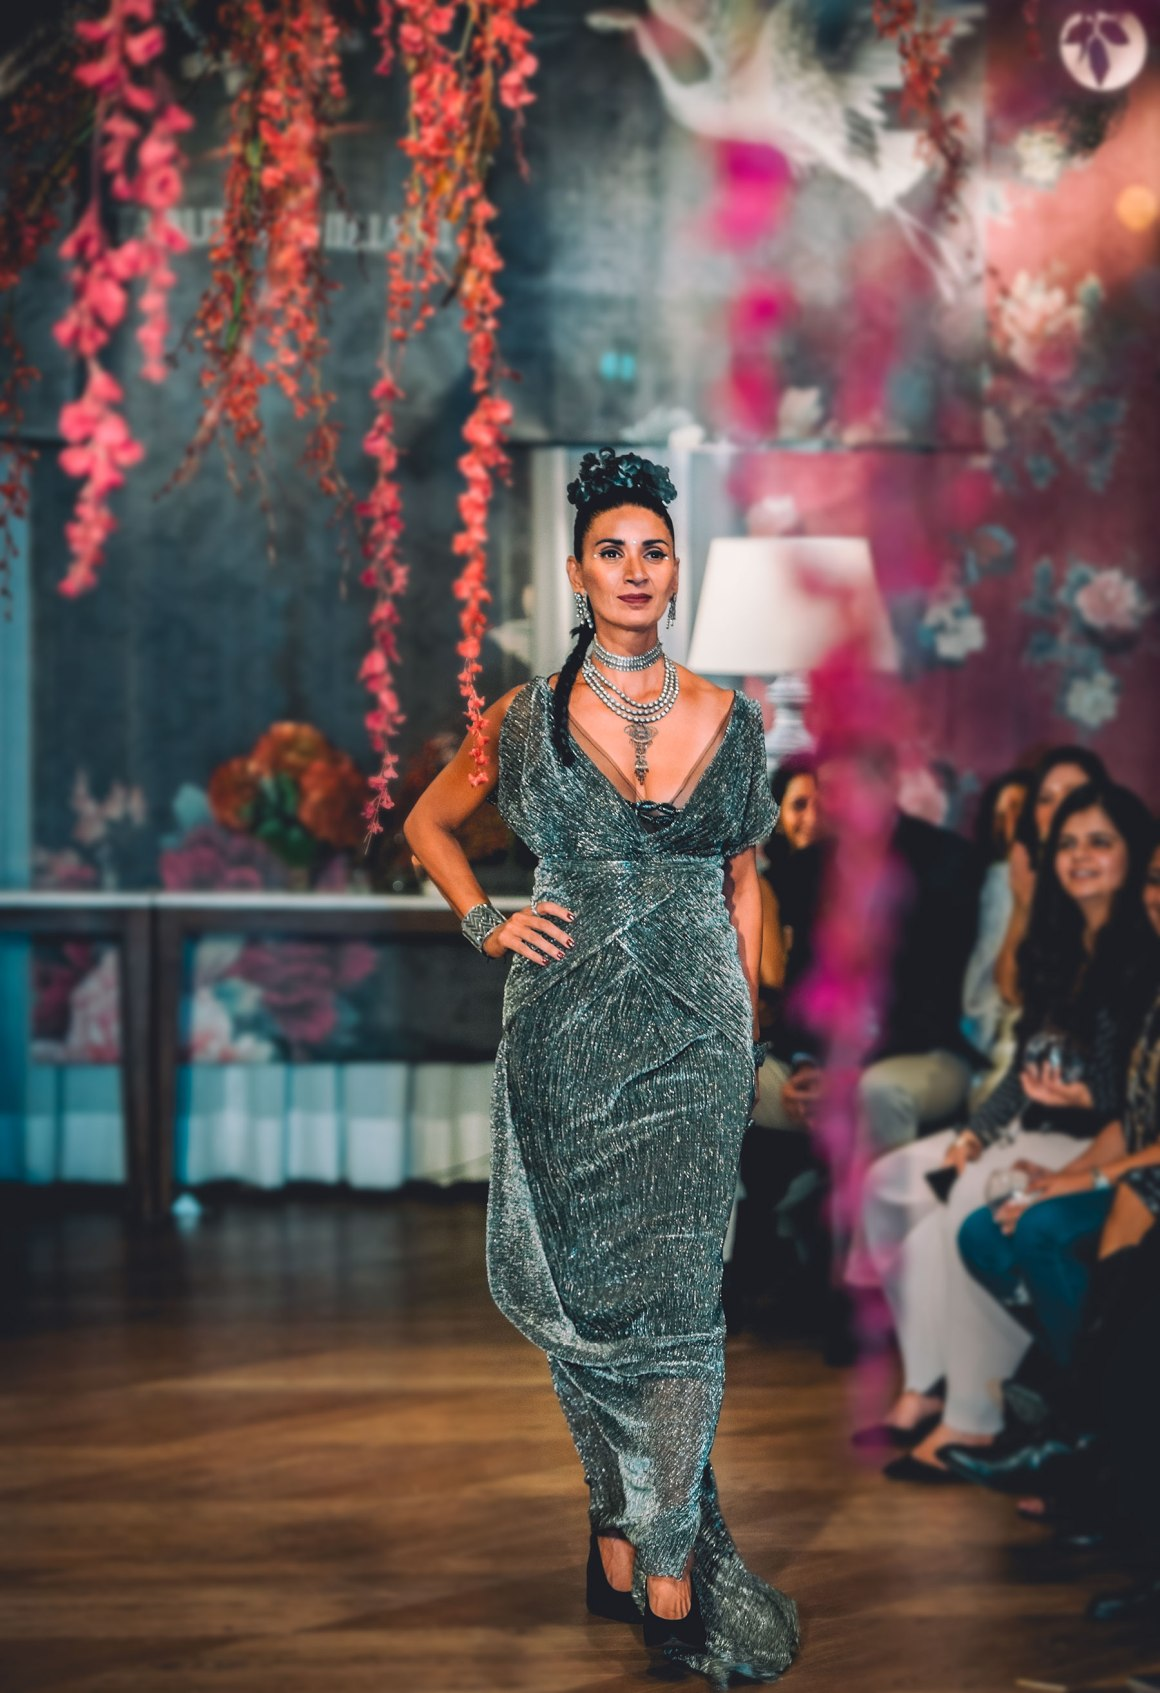 BPFT, Naina.co, Naina Redhu, Blenders Pride Fashion Tour, BPFT2018, MyBlendMyPride, MyStyleMyPride, Gurgaon, The Quorum Club, Pernod Ricard, Fashion Show, Tarun Tahiliani, Disha Patani, Mehr Jessia, Noyonika Chatterjee, Laxmi, Archanay Vijaya, Kubraa Sait, #MadeInIndia, #EyesForLifestyle, #EyesForFashion, Blender's Pride Whisky, Whiskey, Whisky, Whisky Event, Professional Photographer, Photography Client